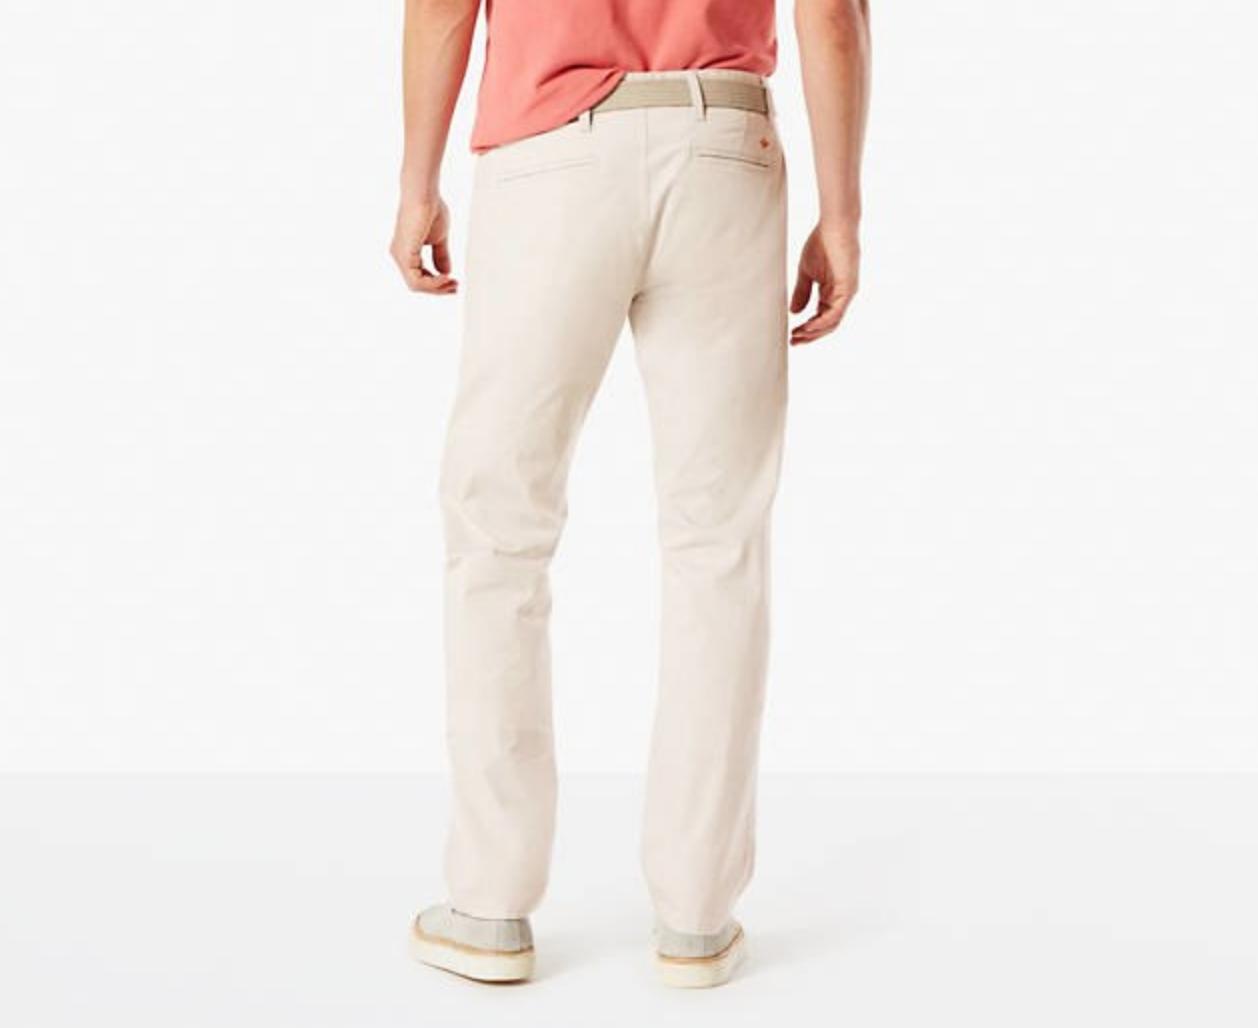 marfc forne pantalones blancos